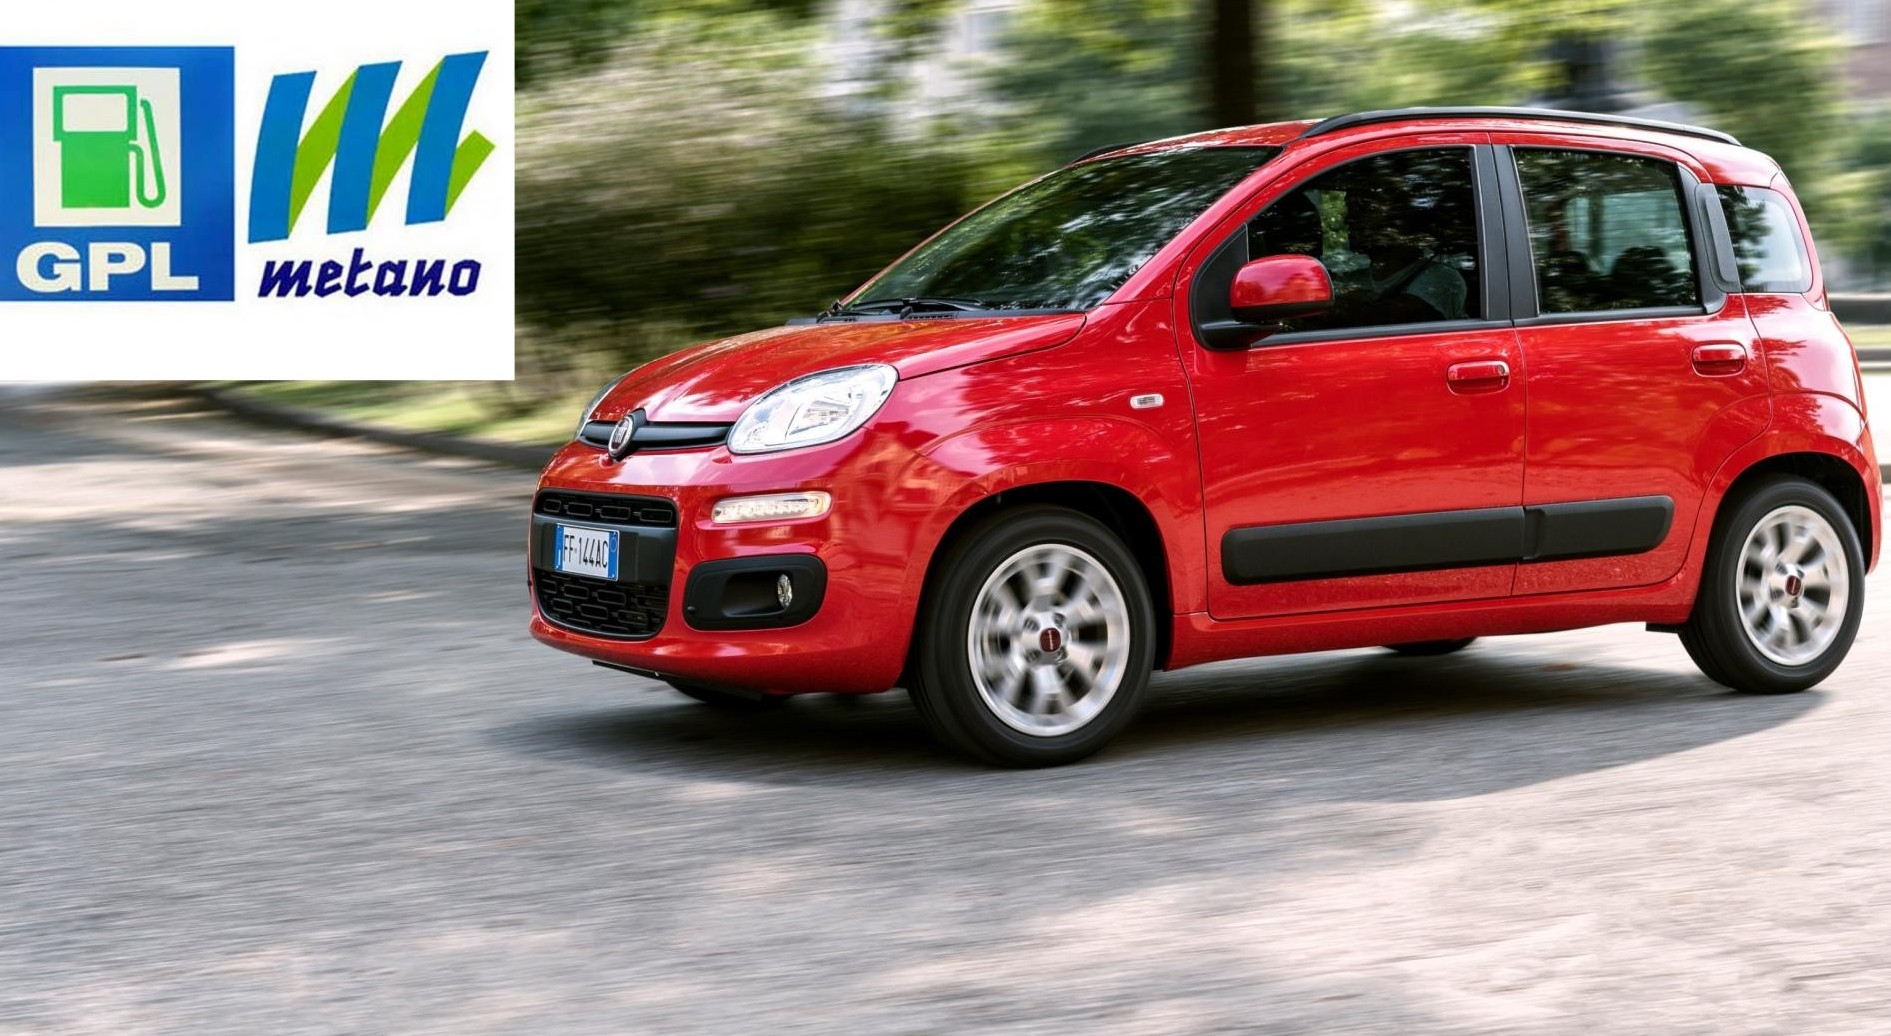 Fiat Panda a metano o gpl, quale modello